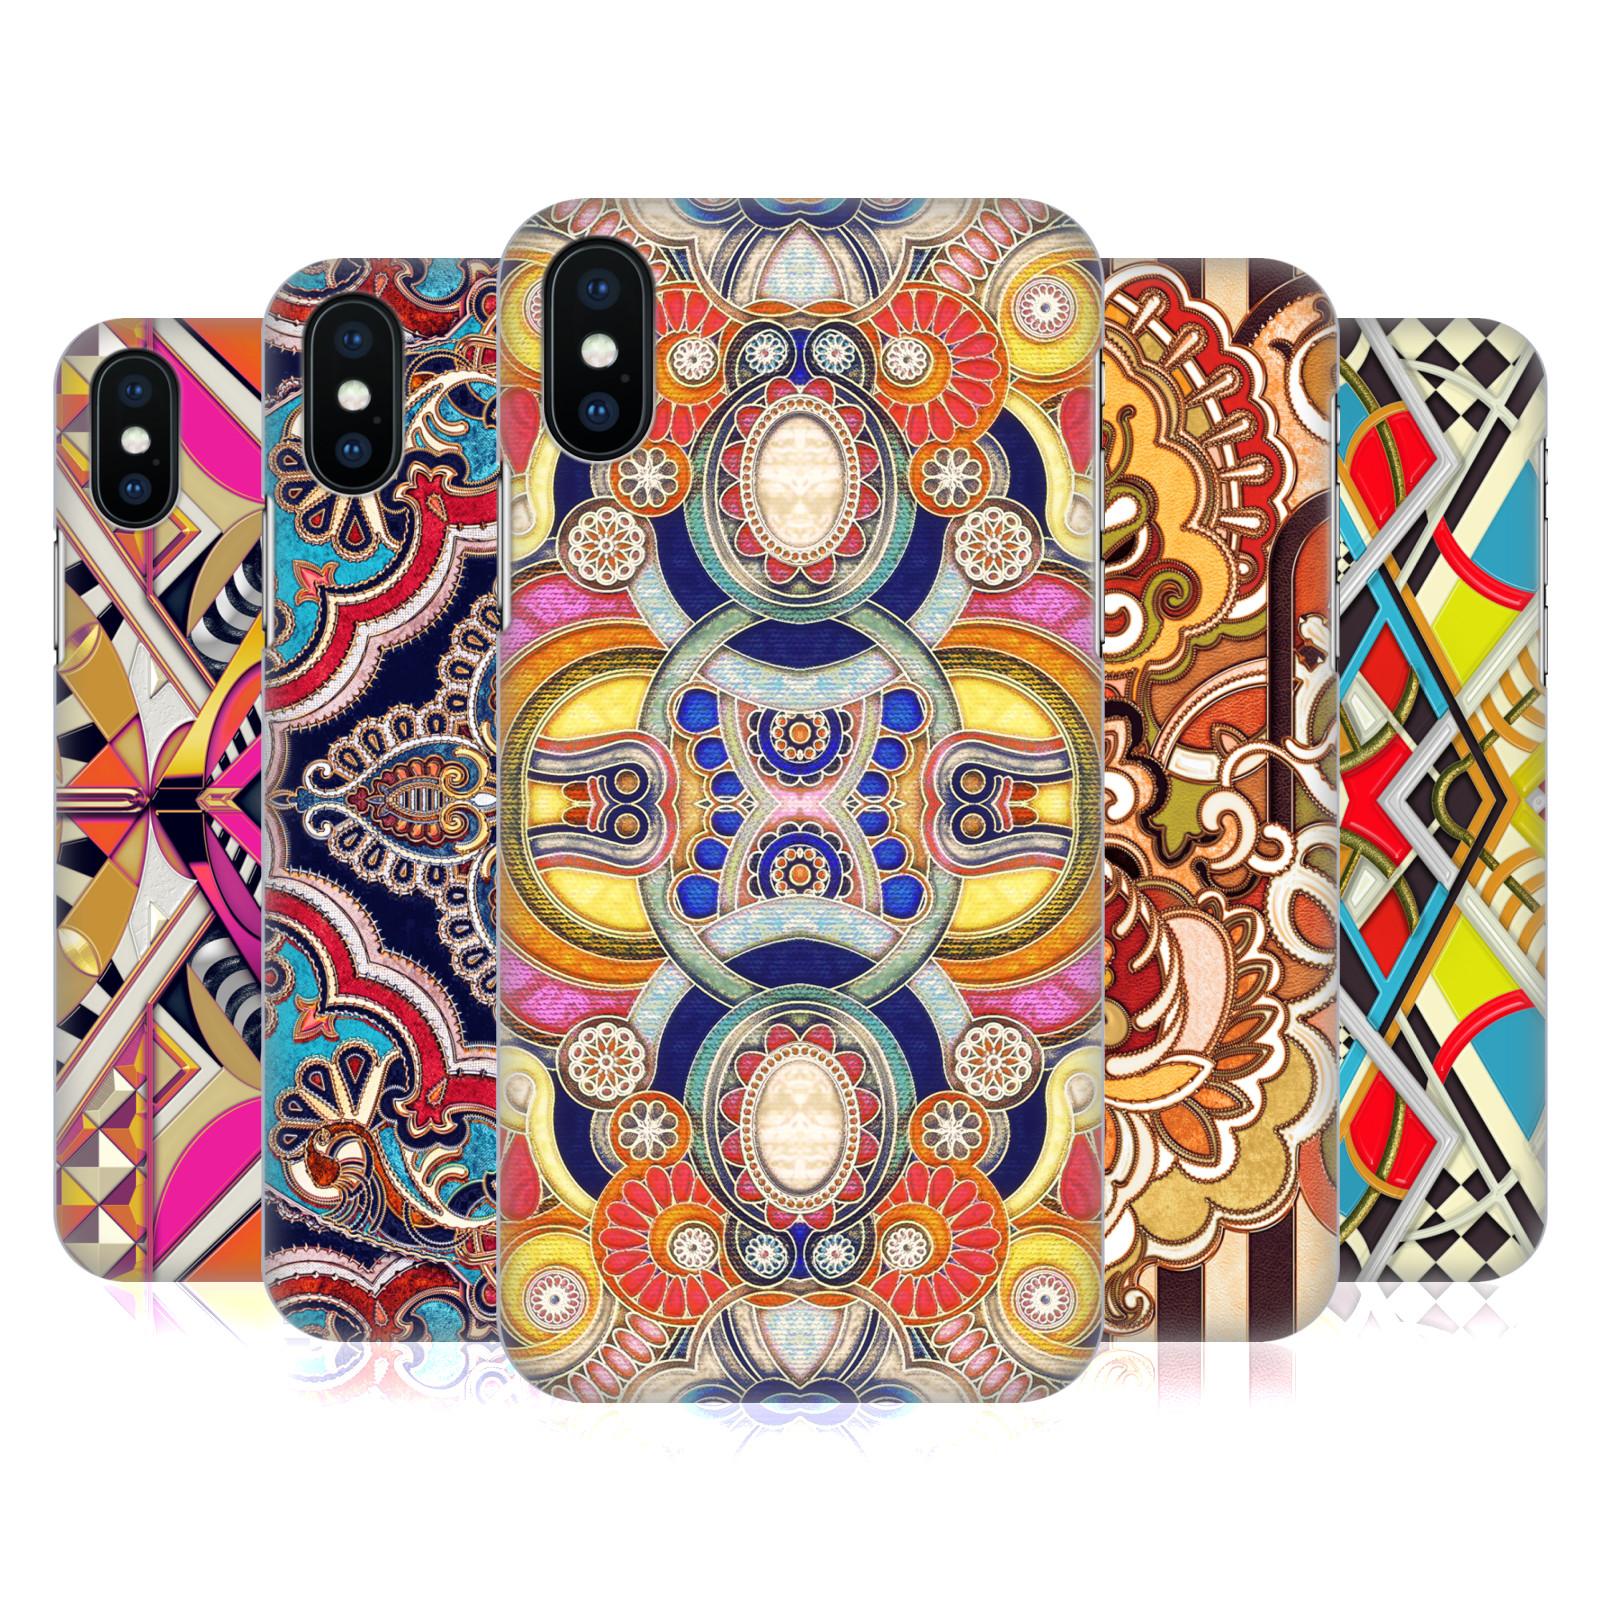 Giulio Rossi Patterns